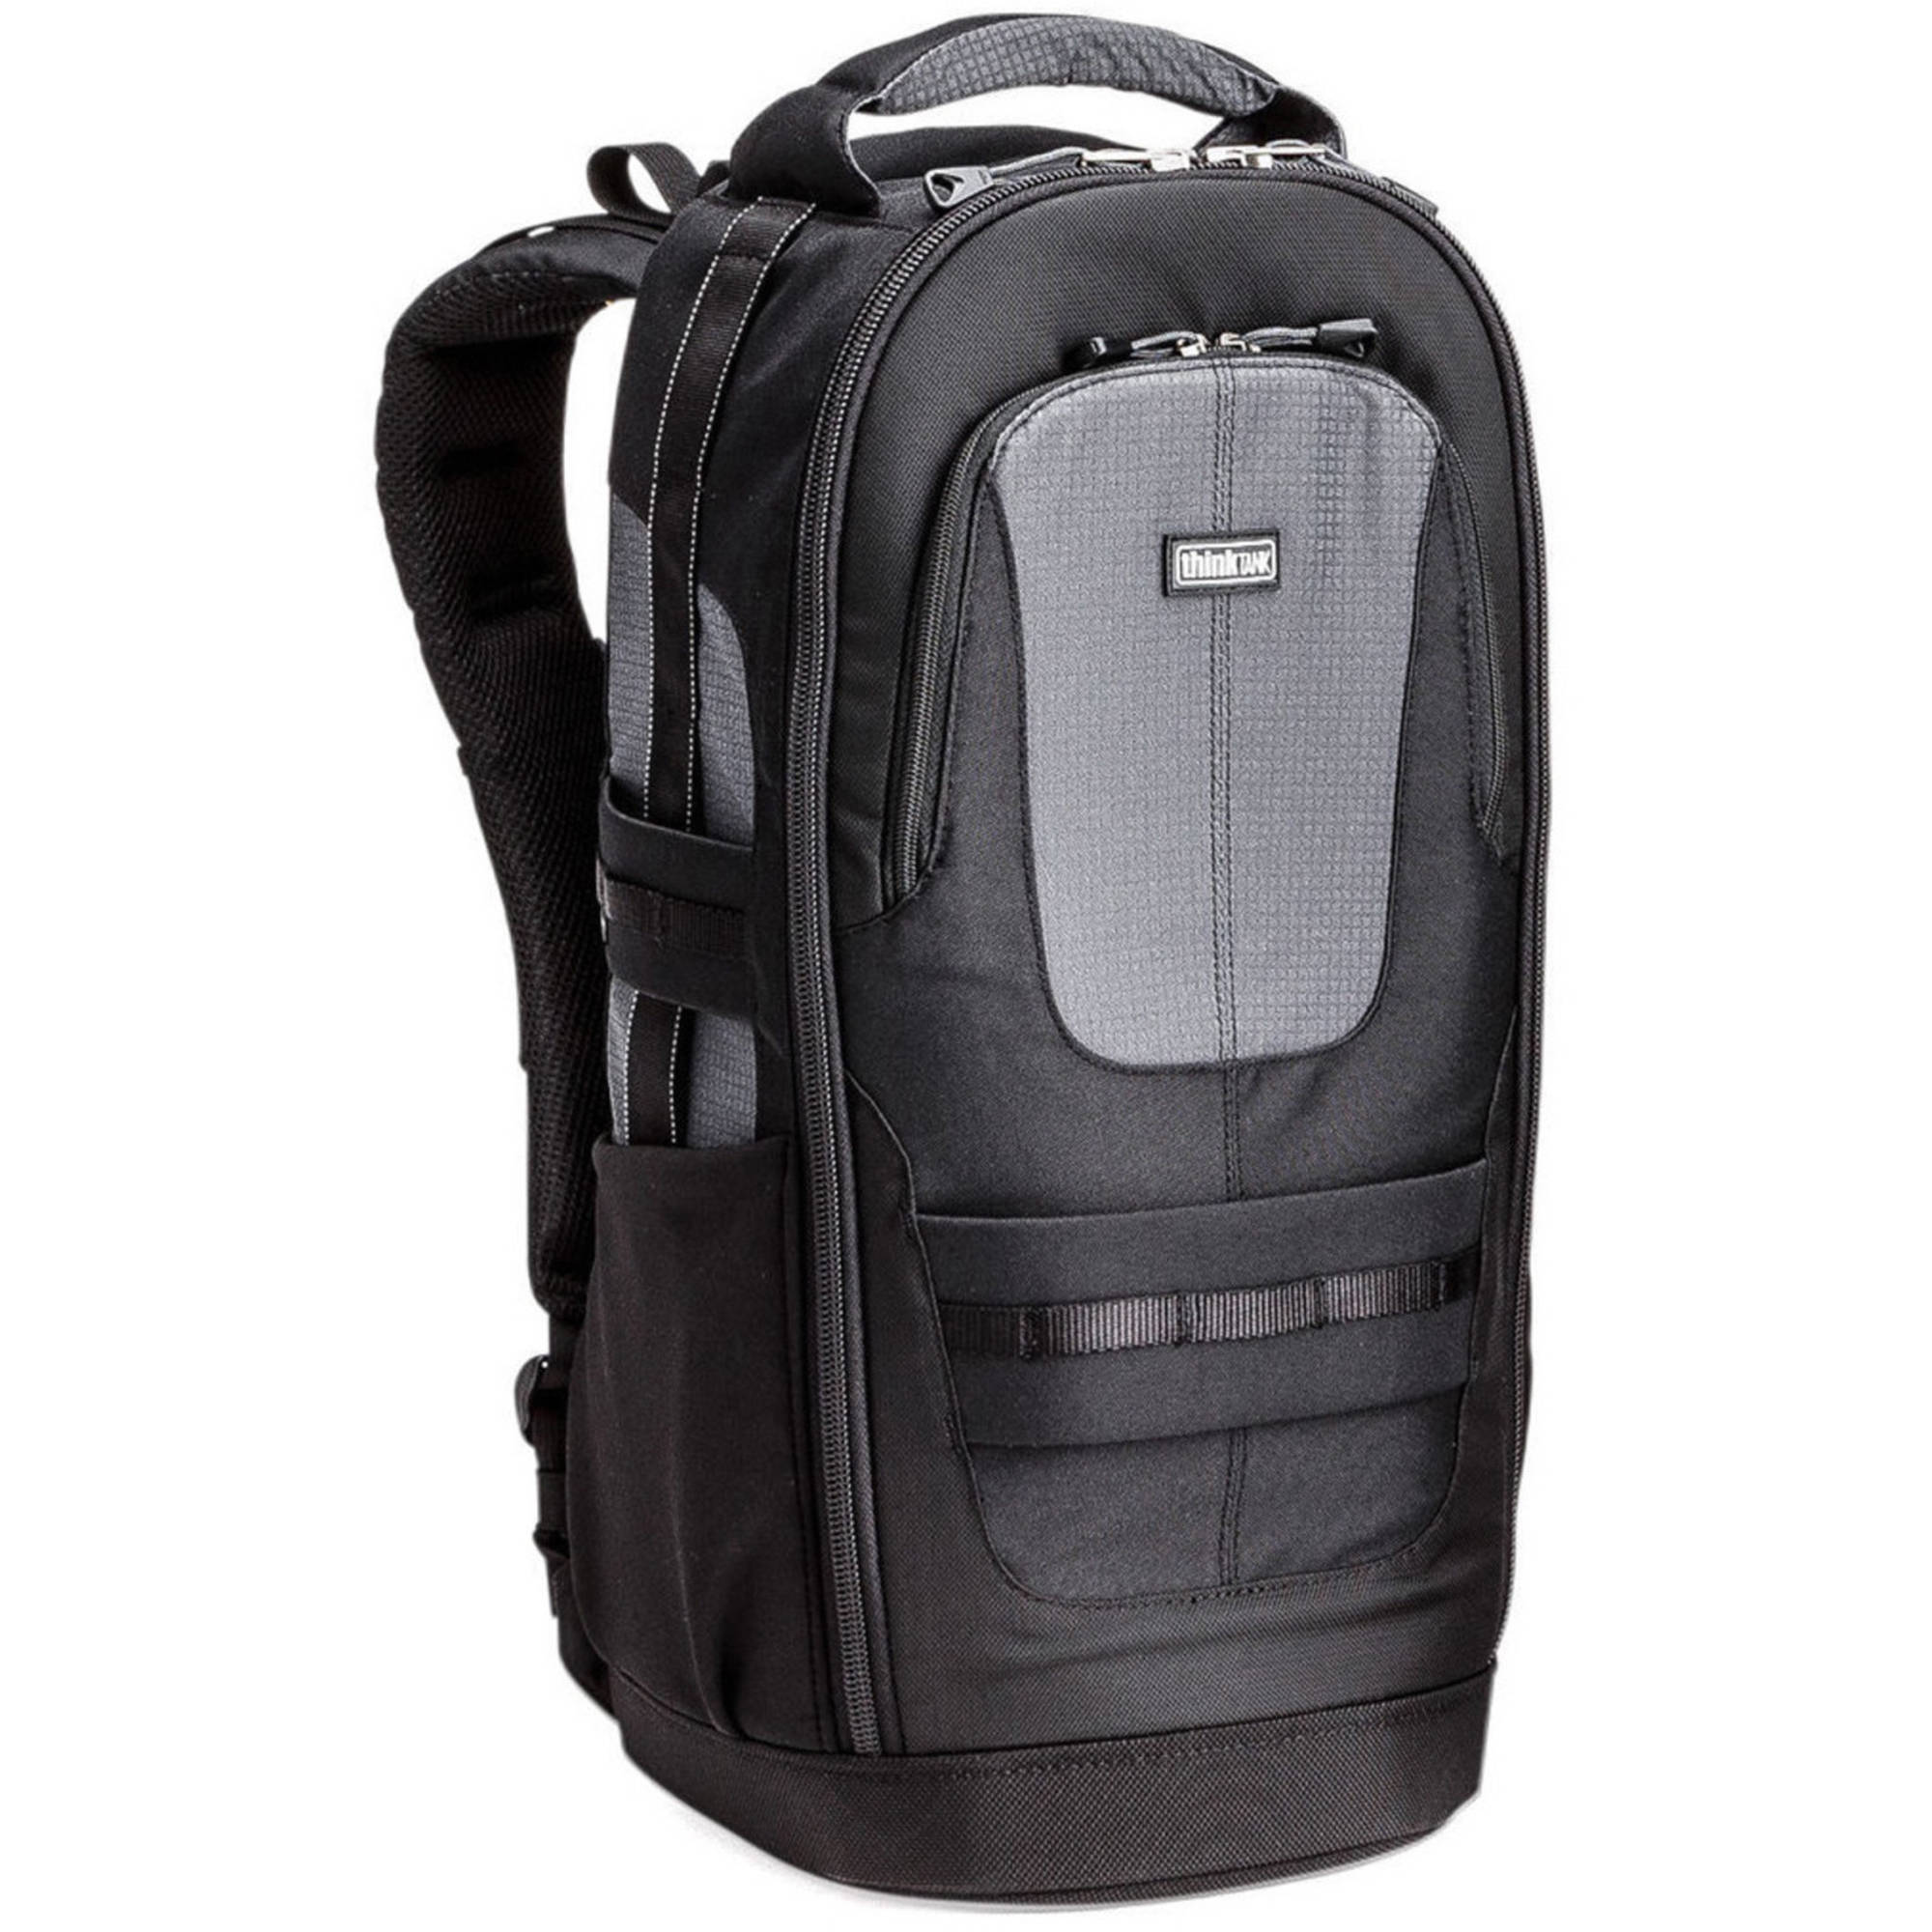 Think Tank Photo Glass Limo Backpack (Black) 720192 B H Photo d974b0114ed2e